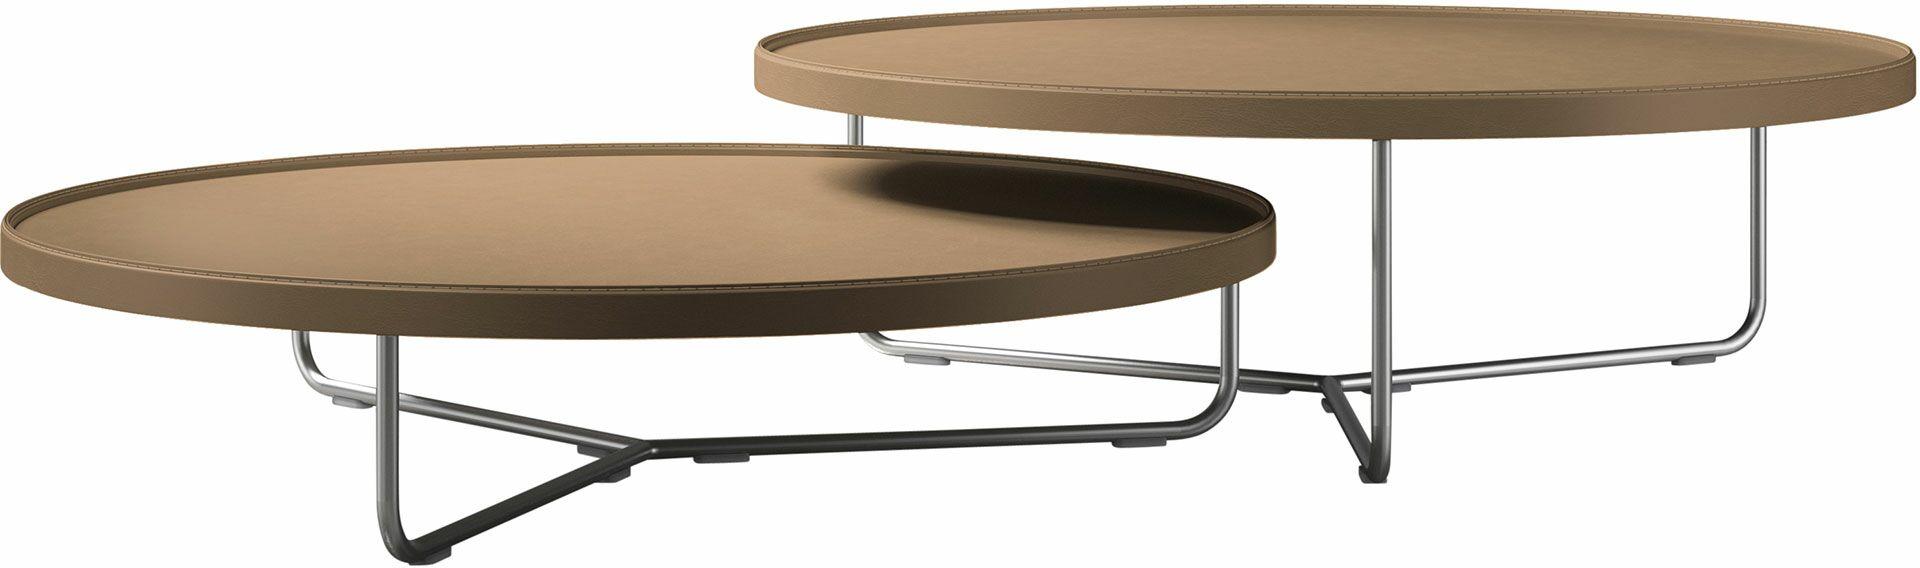 Adelphi 2 Piece Nesting Table Set Color: Dark Beige Reclaimed Leather